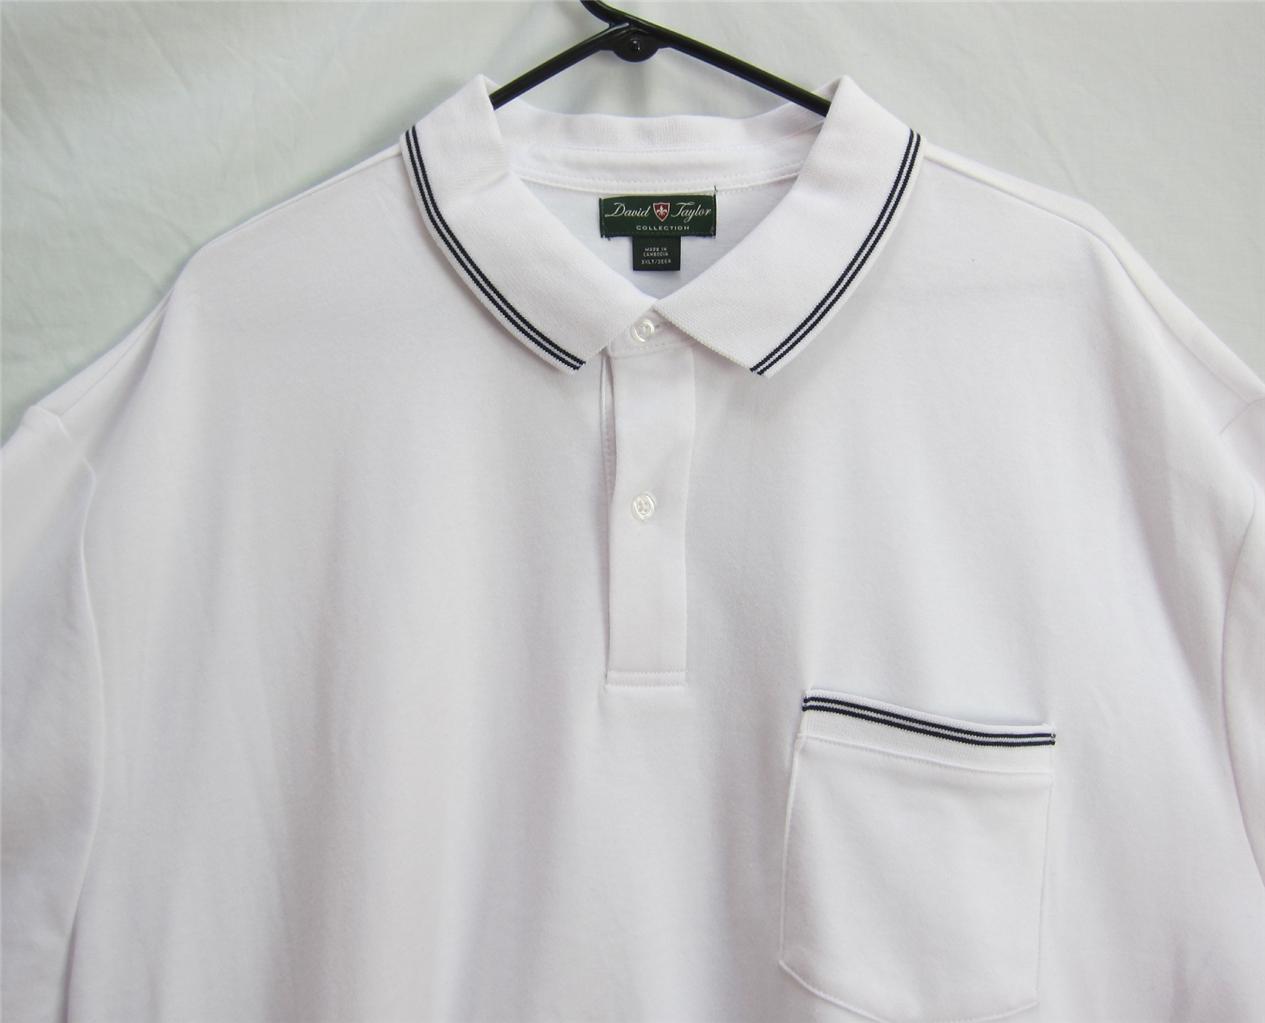 nwt mens david taylor polo shirt big tall 3xl 3xlt 4xl